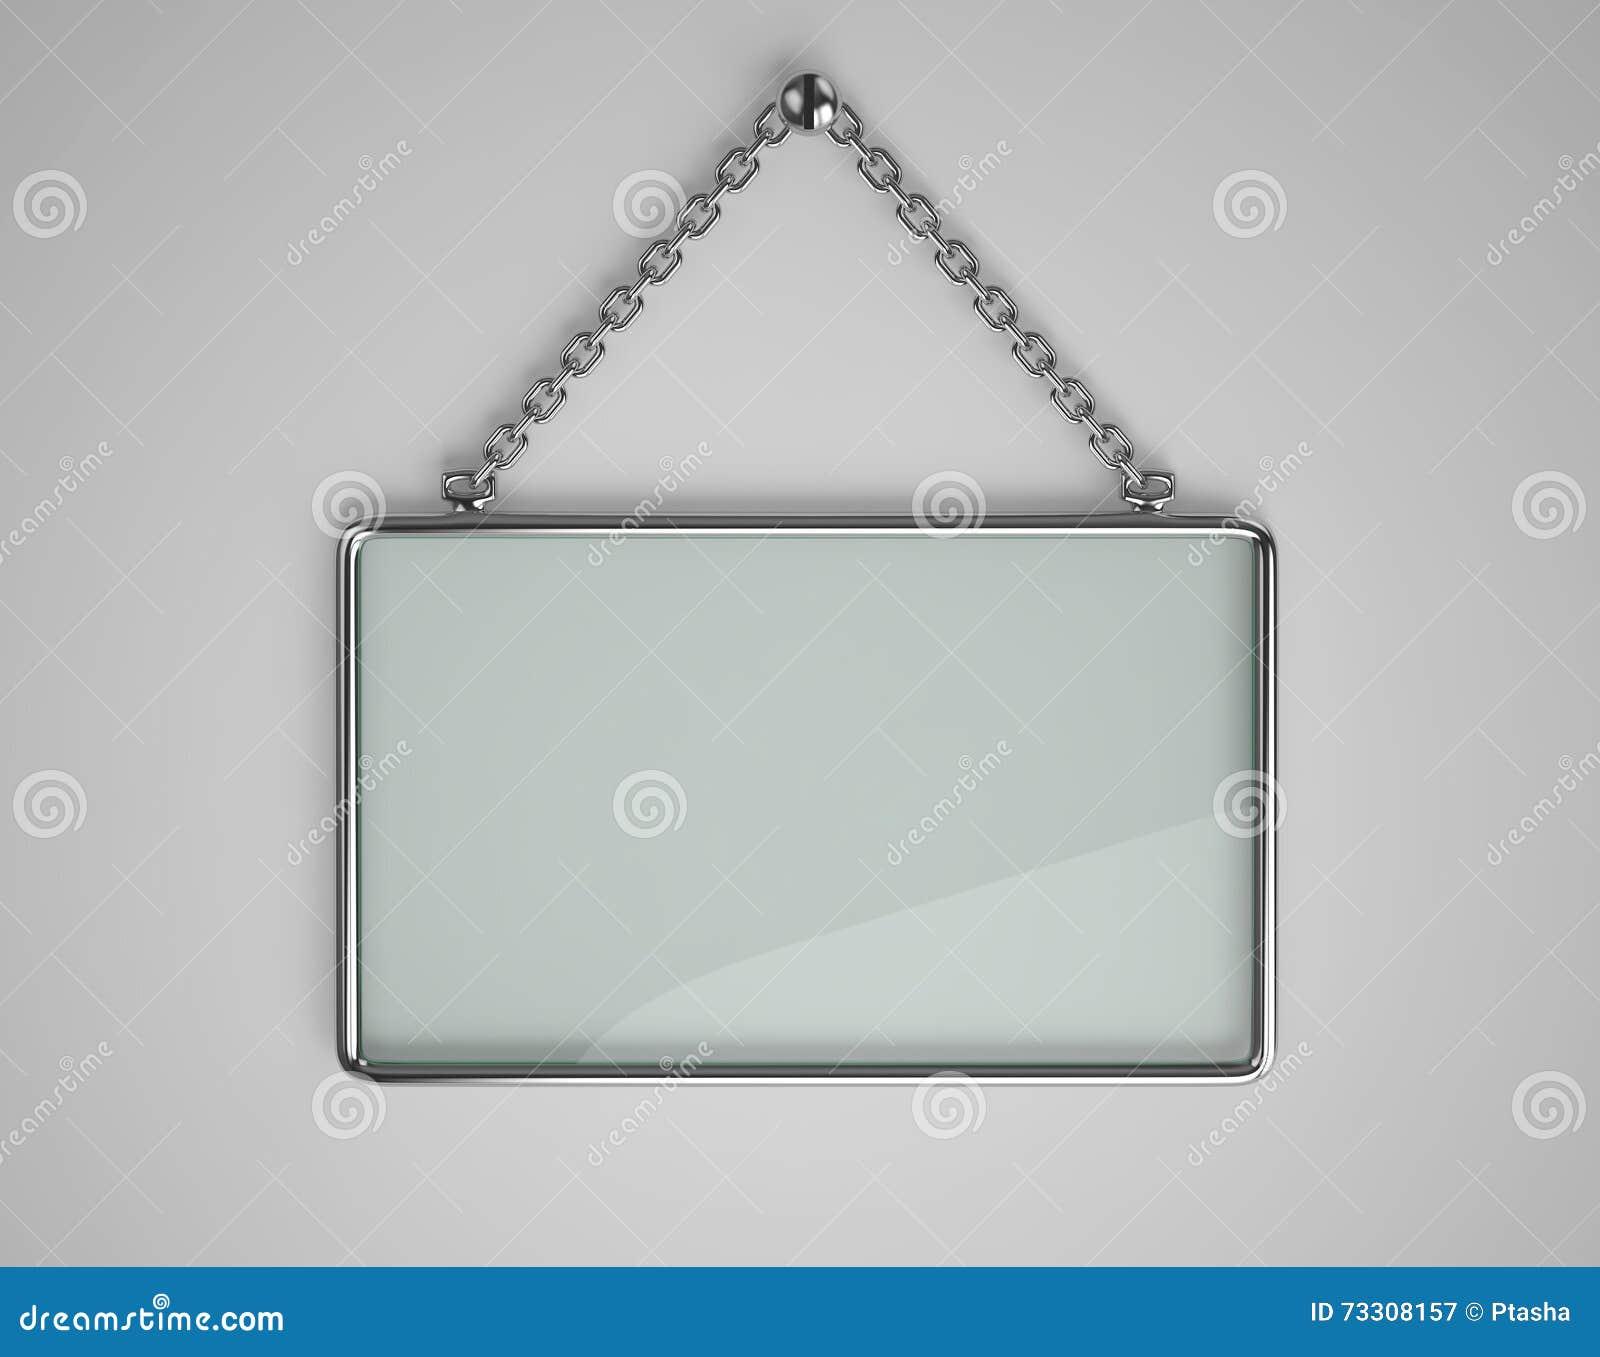 Glass Board With Metal Frame Stock Illustration - Illustration of ...